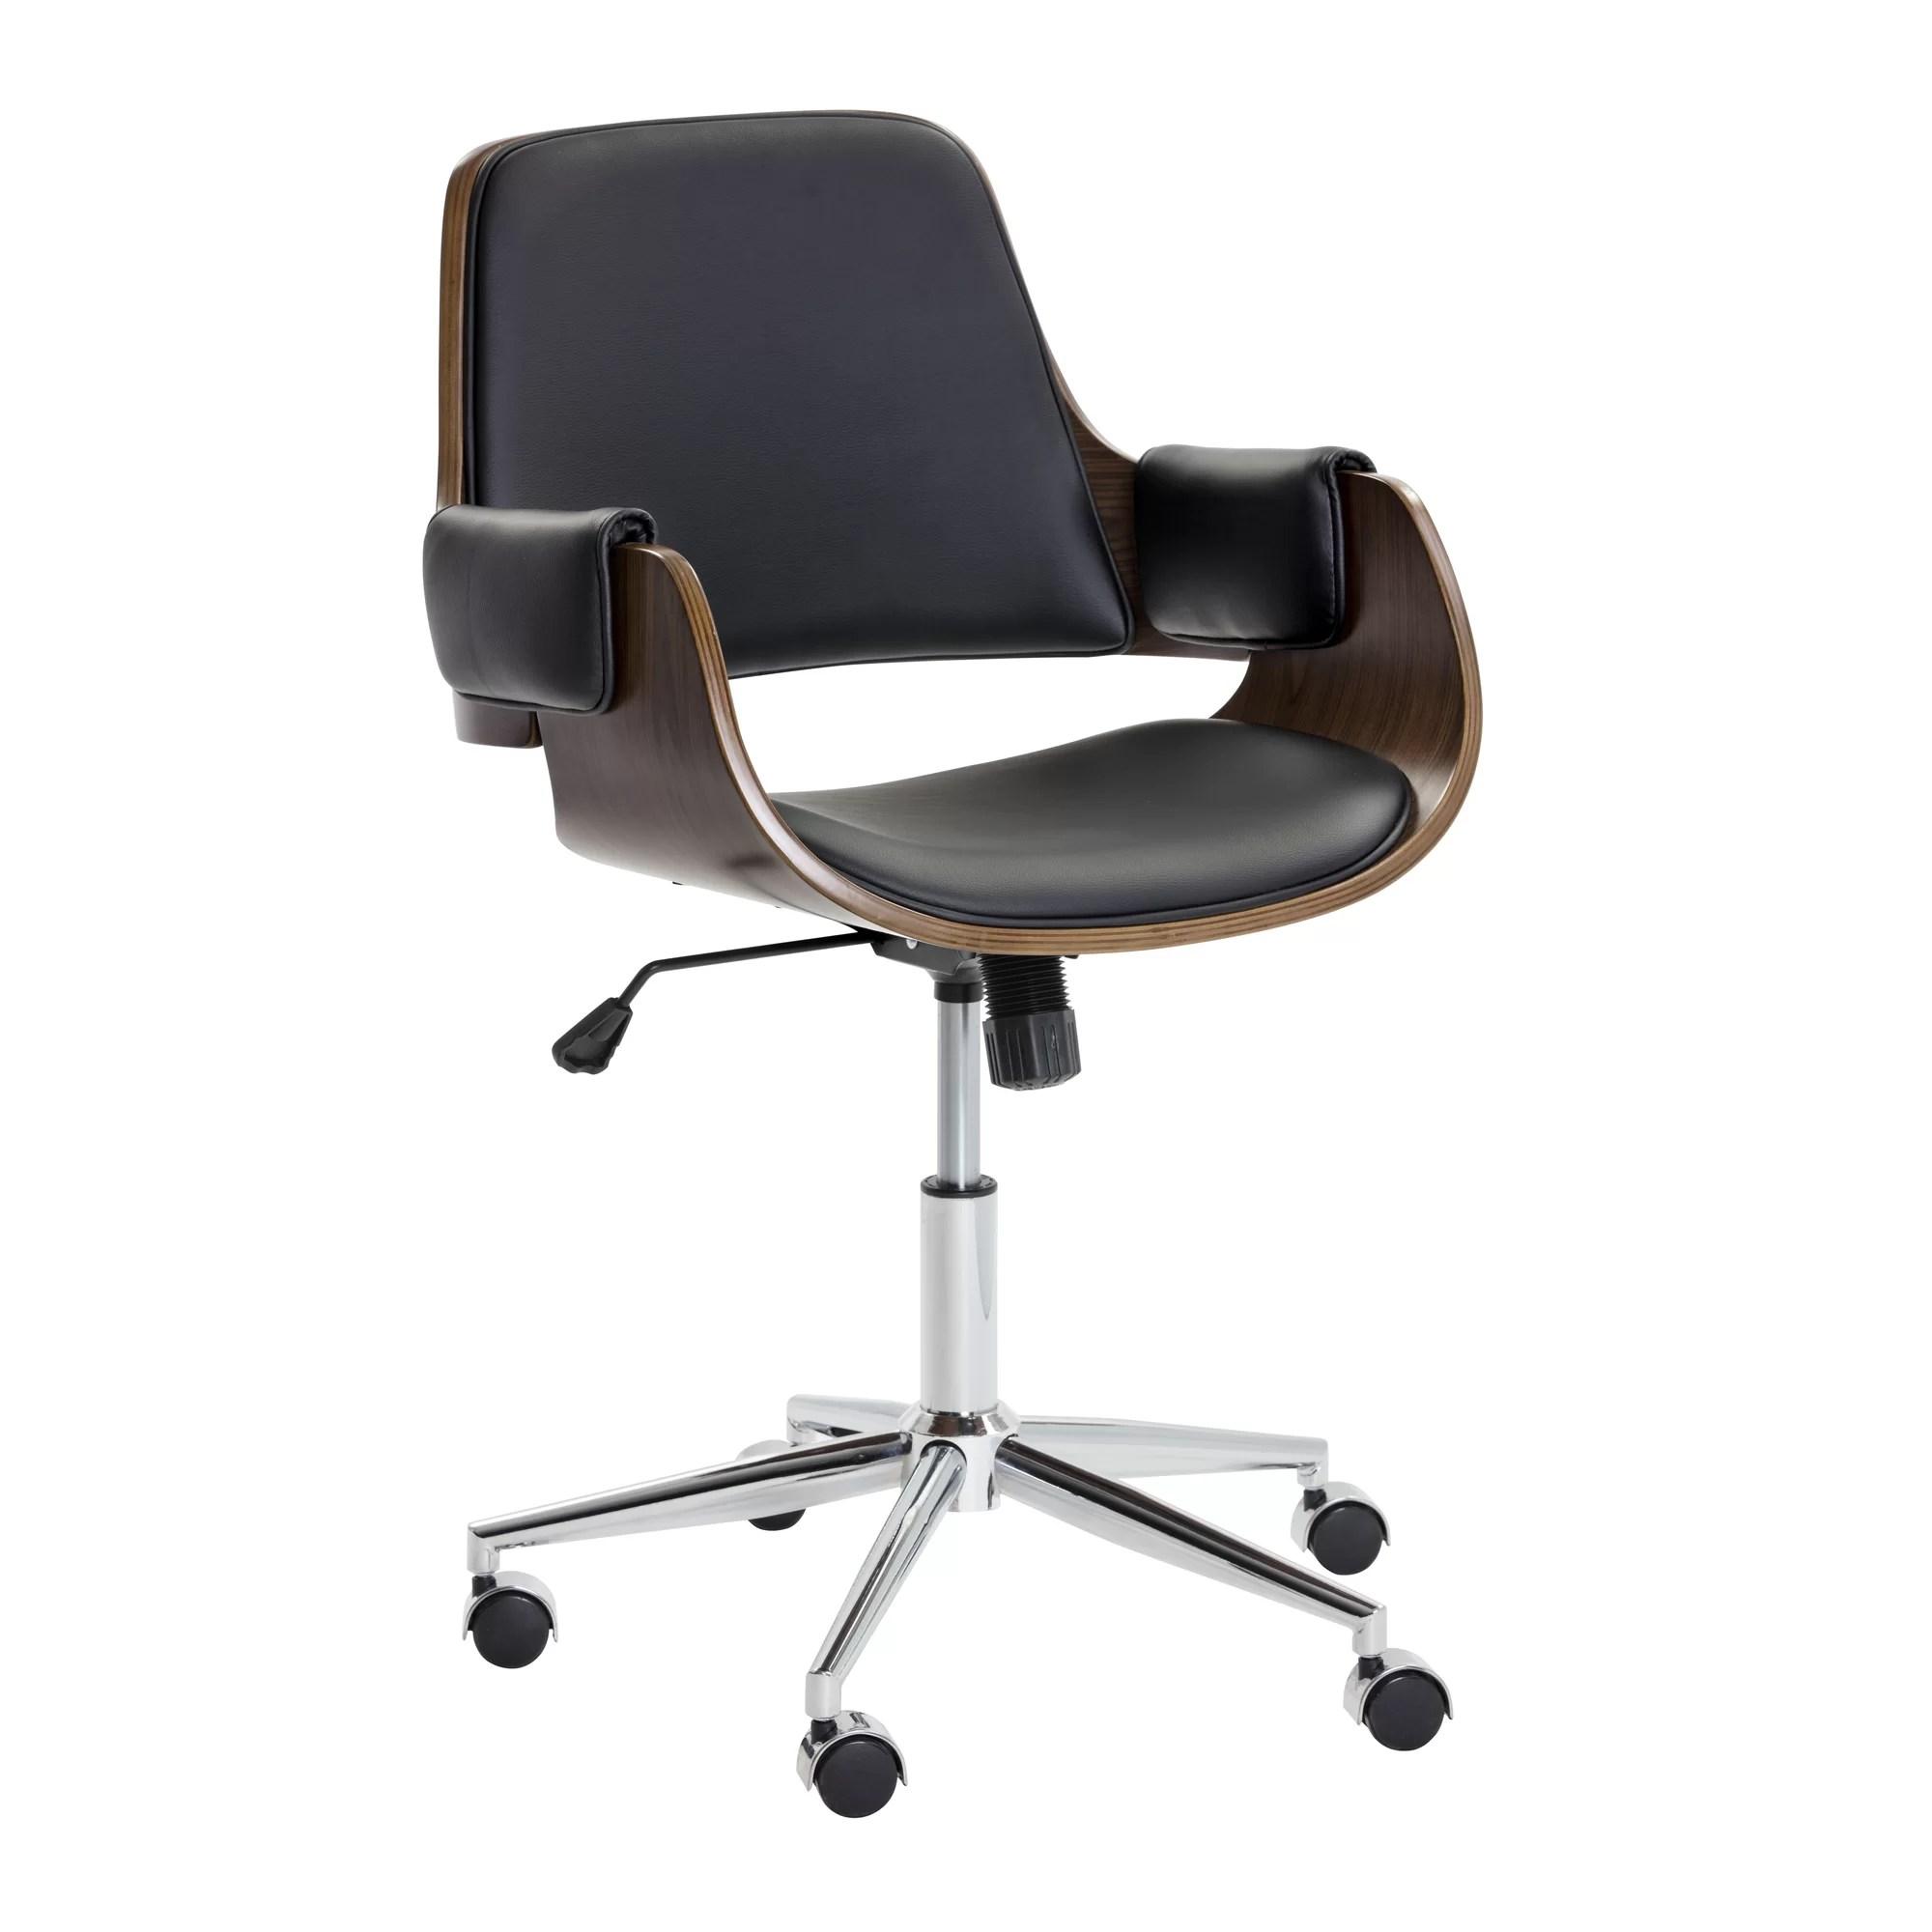 desk chair is too low leg pads home depot sunpan modern kellan back and reviews